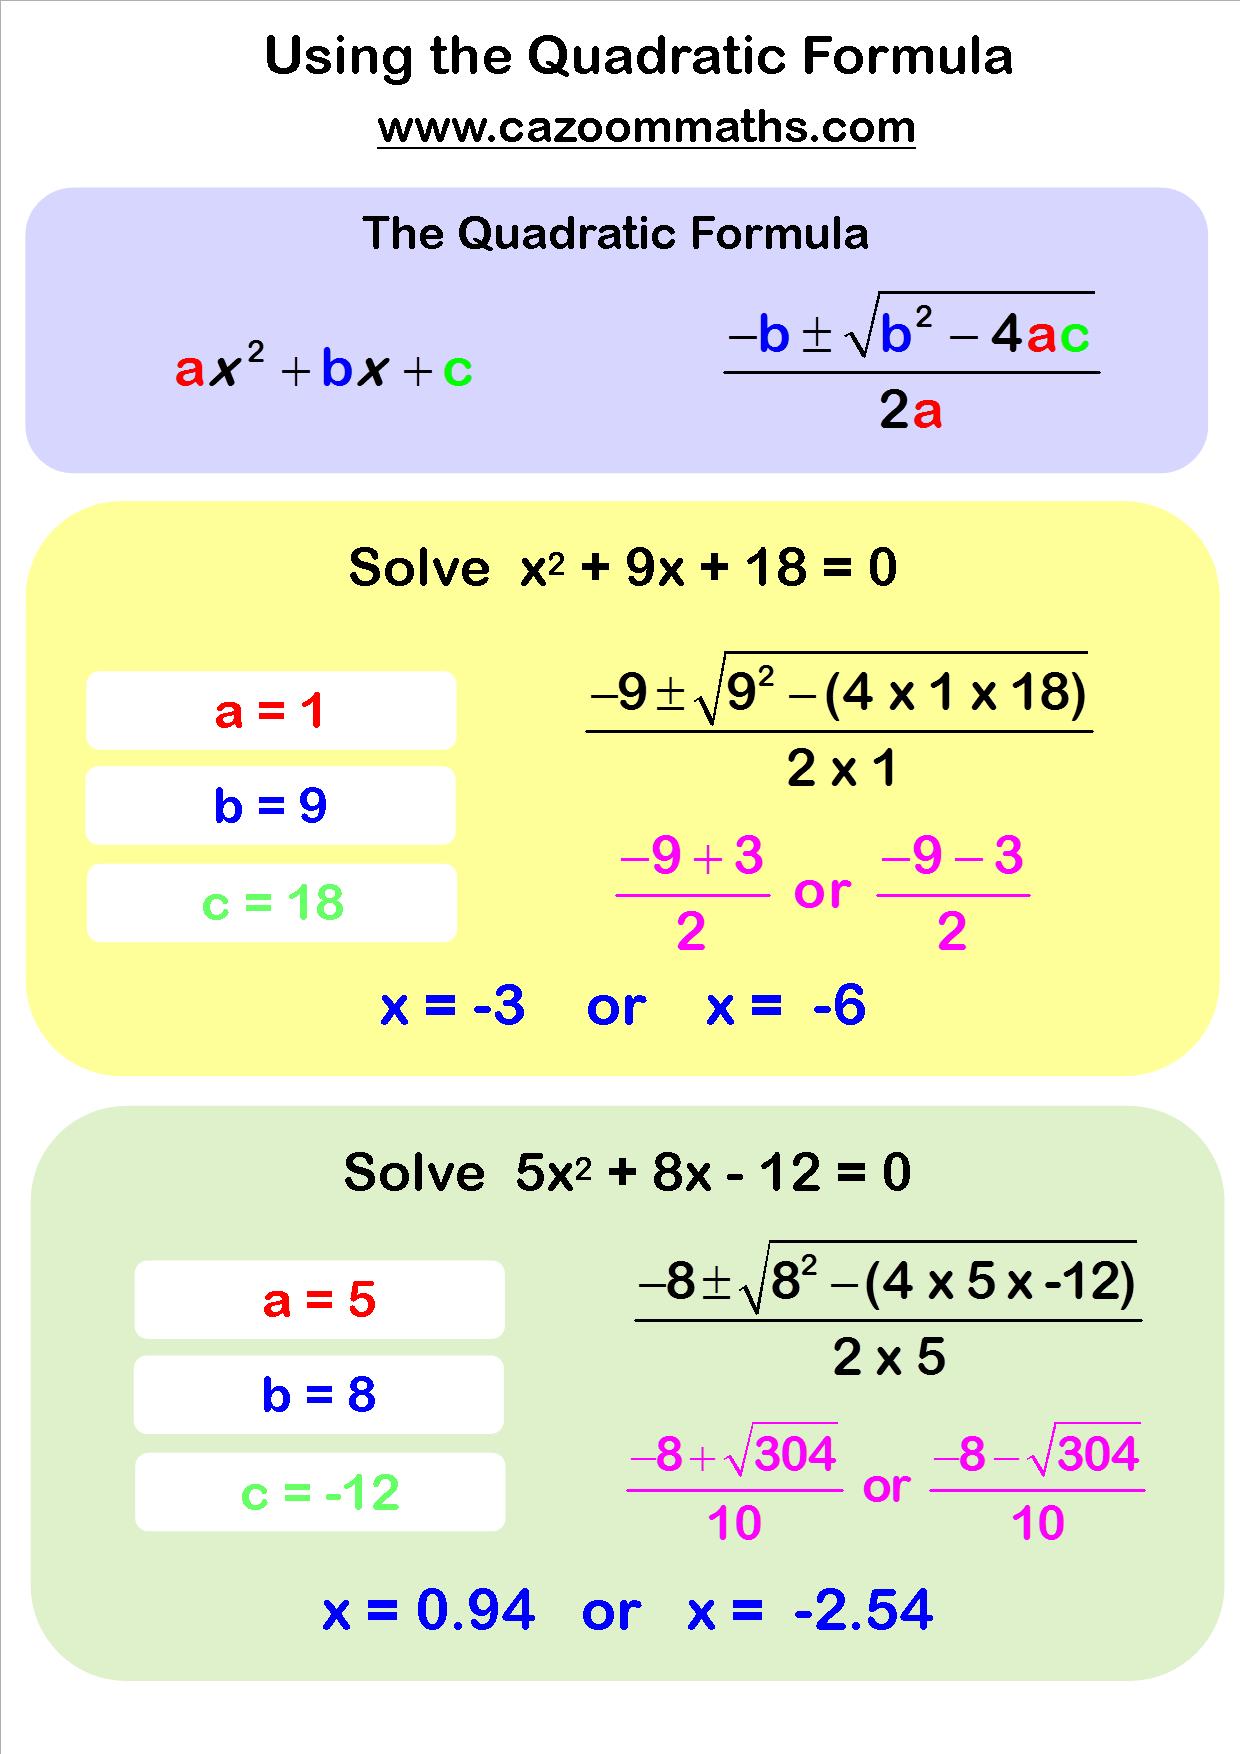 Worksheet Using The Quadratic Formula Worksheet Solving